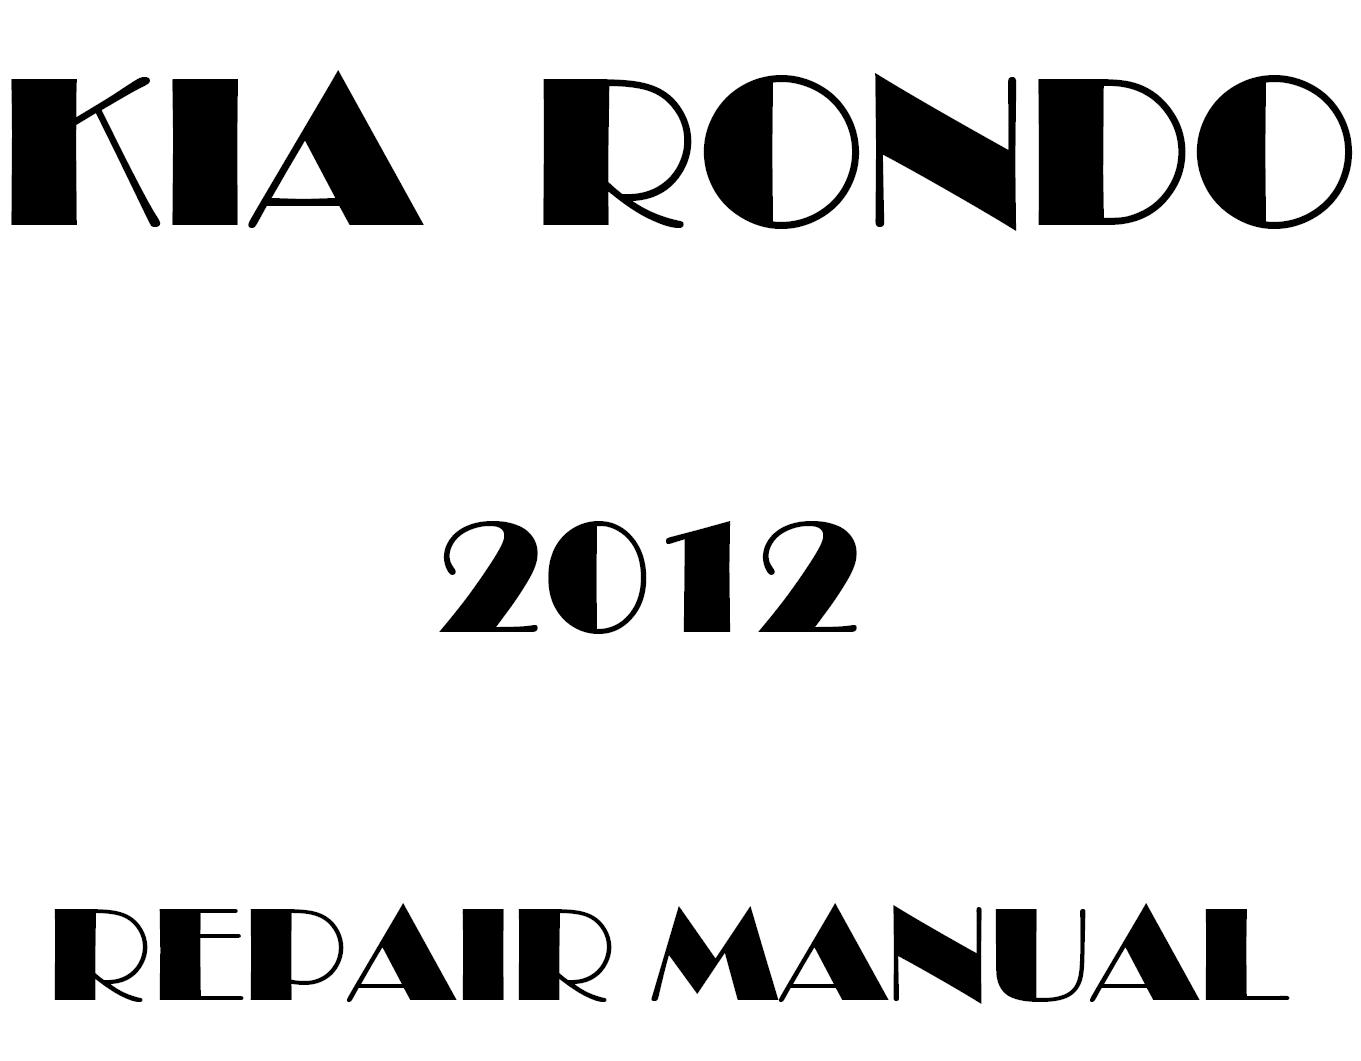 2012 Kia Rondo repair manual